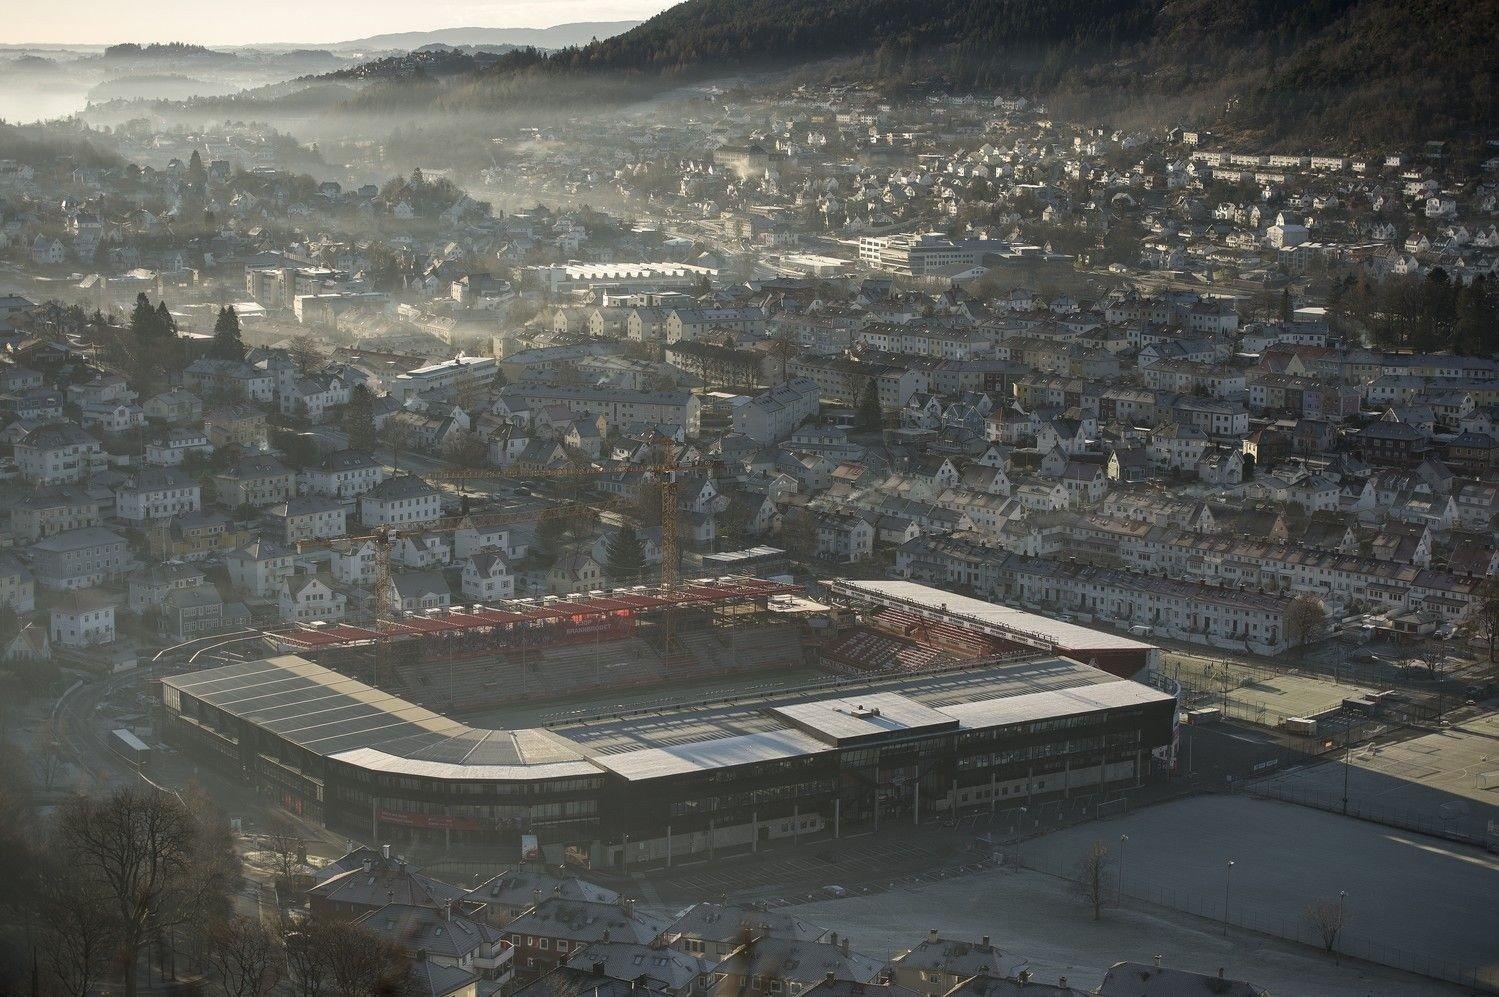 På bildet: Bydelen Minde like sør for Bergen sentrum med Brann stadion.